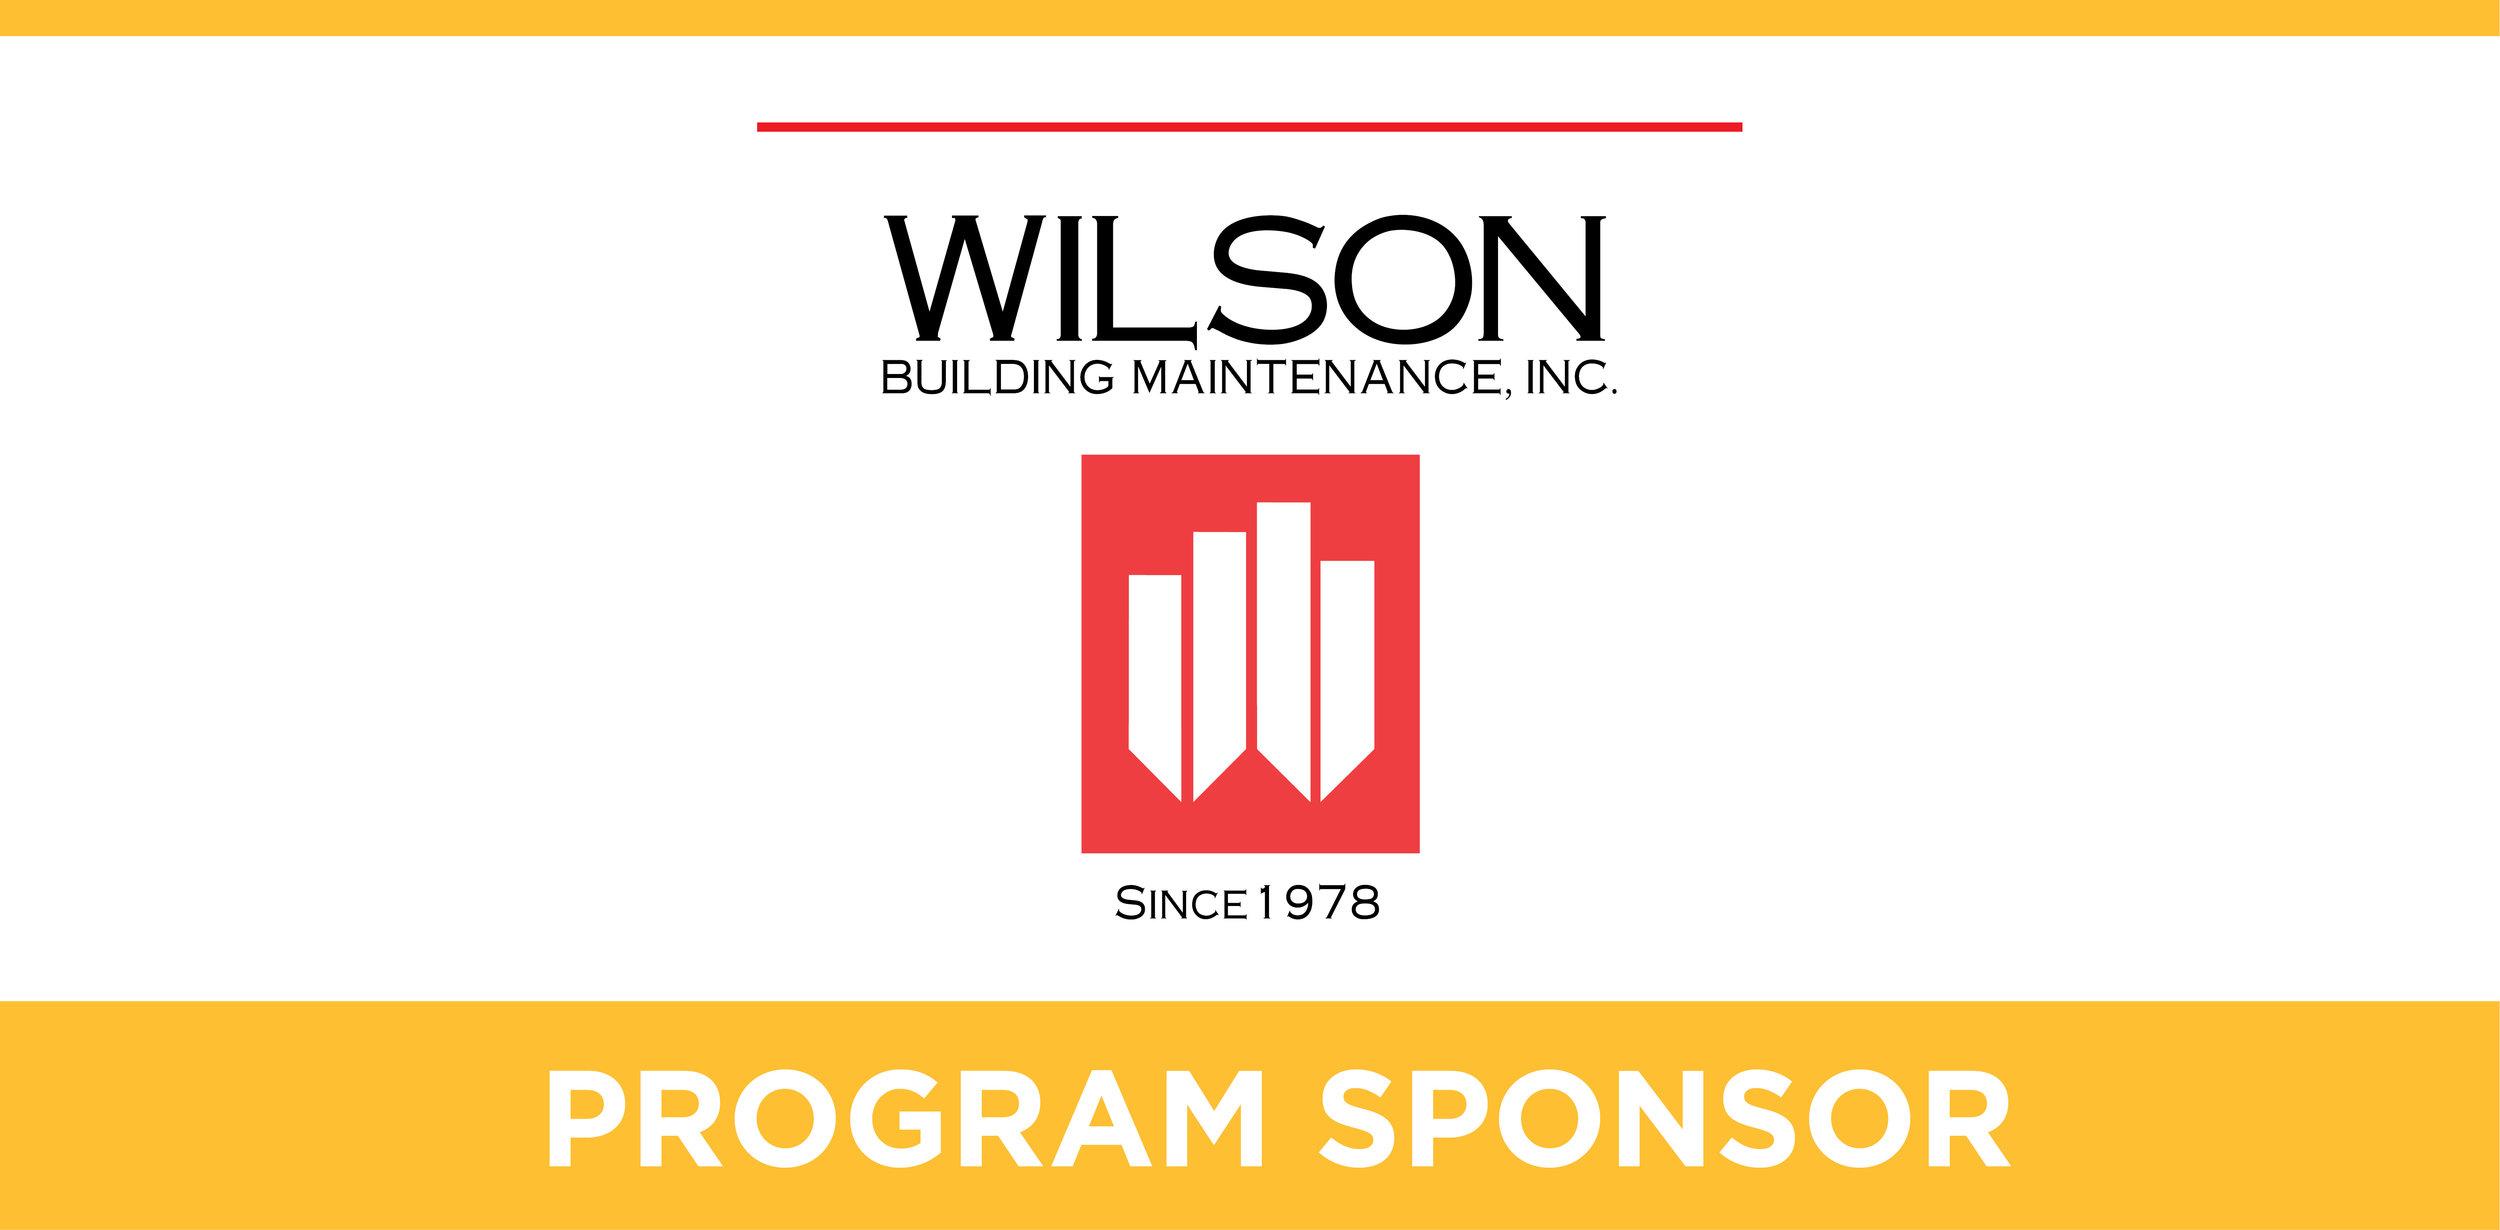 Wilson SBF19 Web Sponsor Sign.jpg